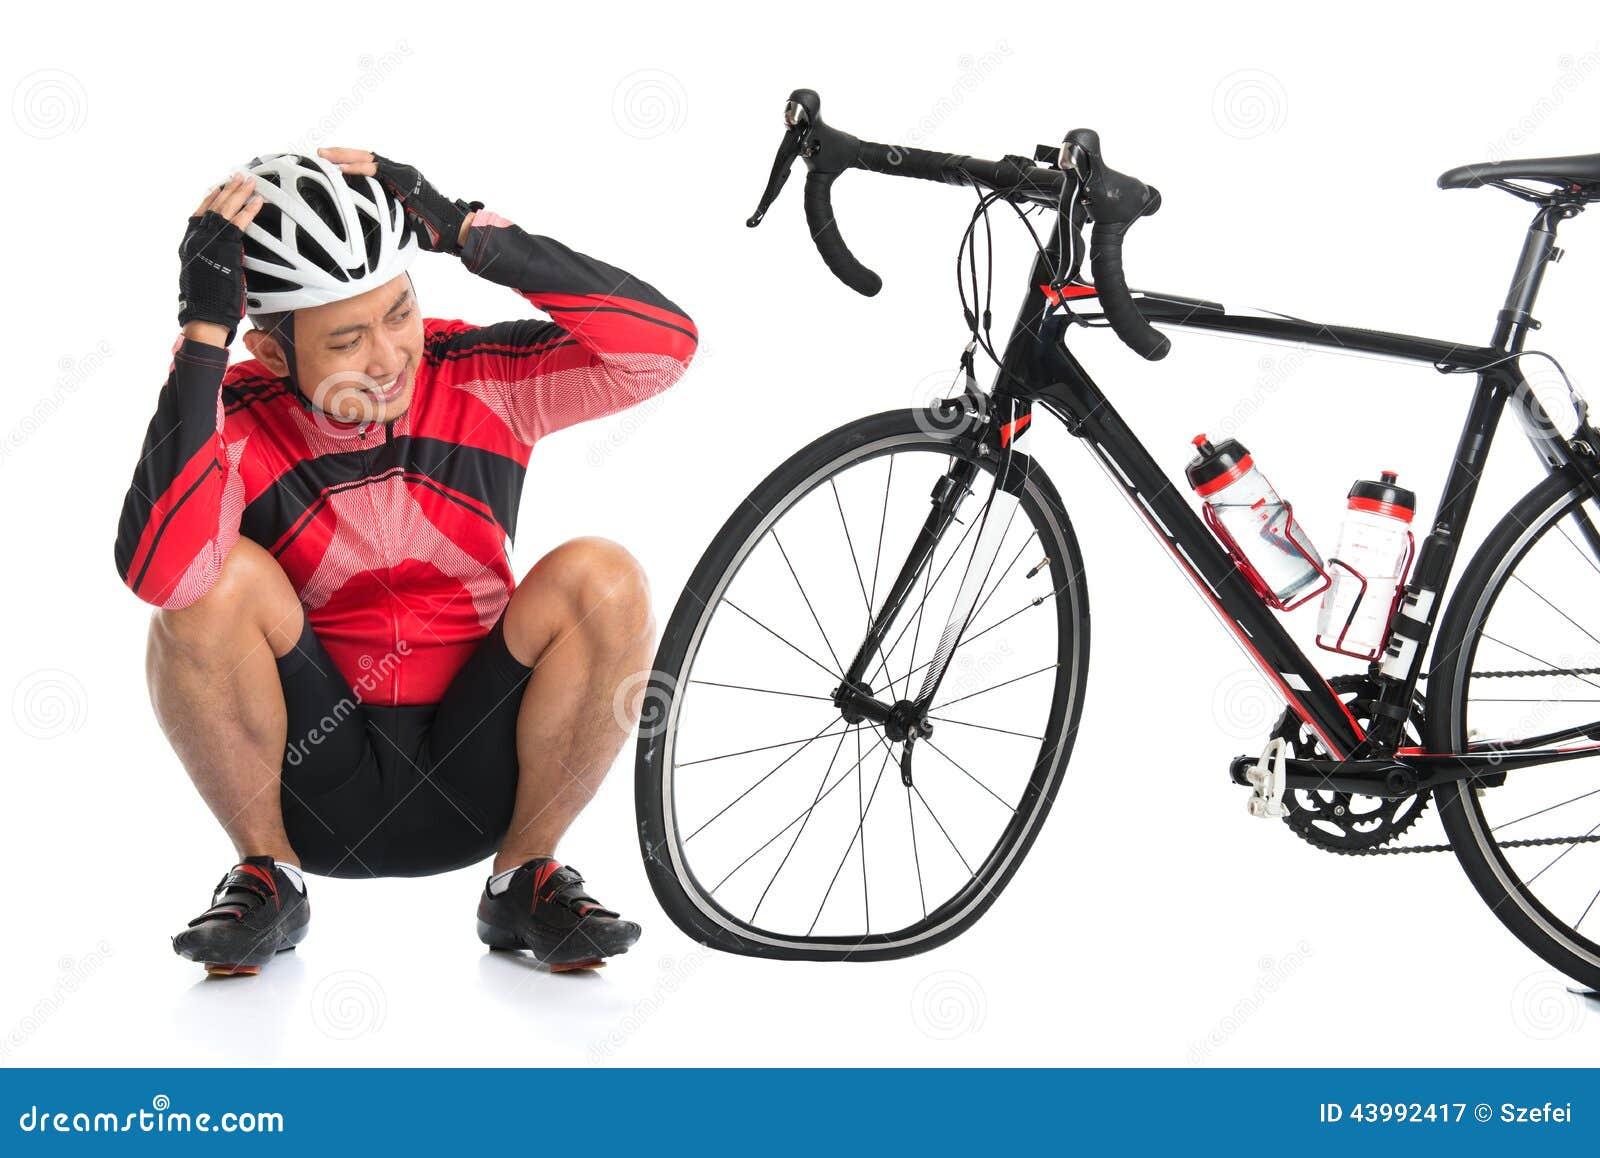 Flat tire bike stock image. Image of cycle, cycler ...